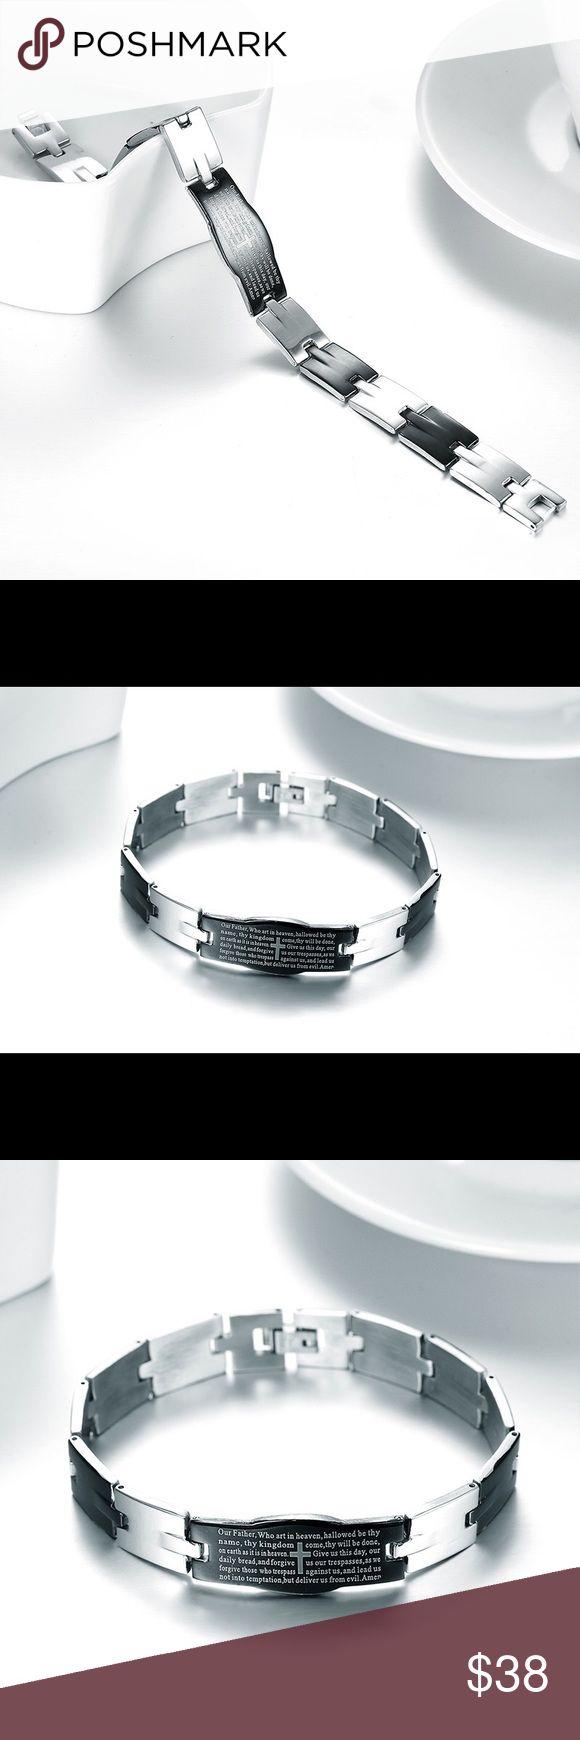 Bracelet en forme de 8 signification